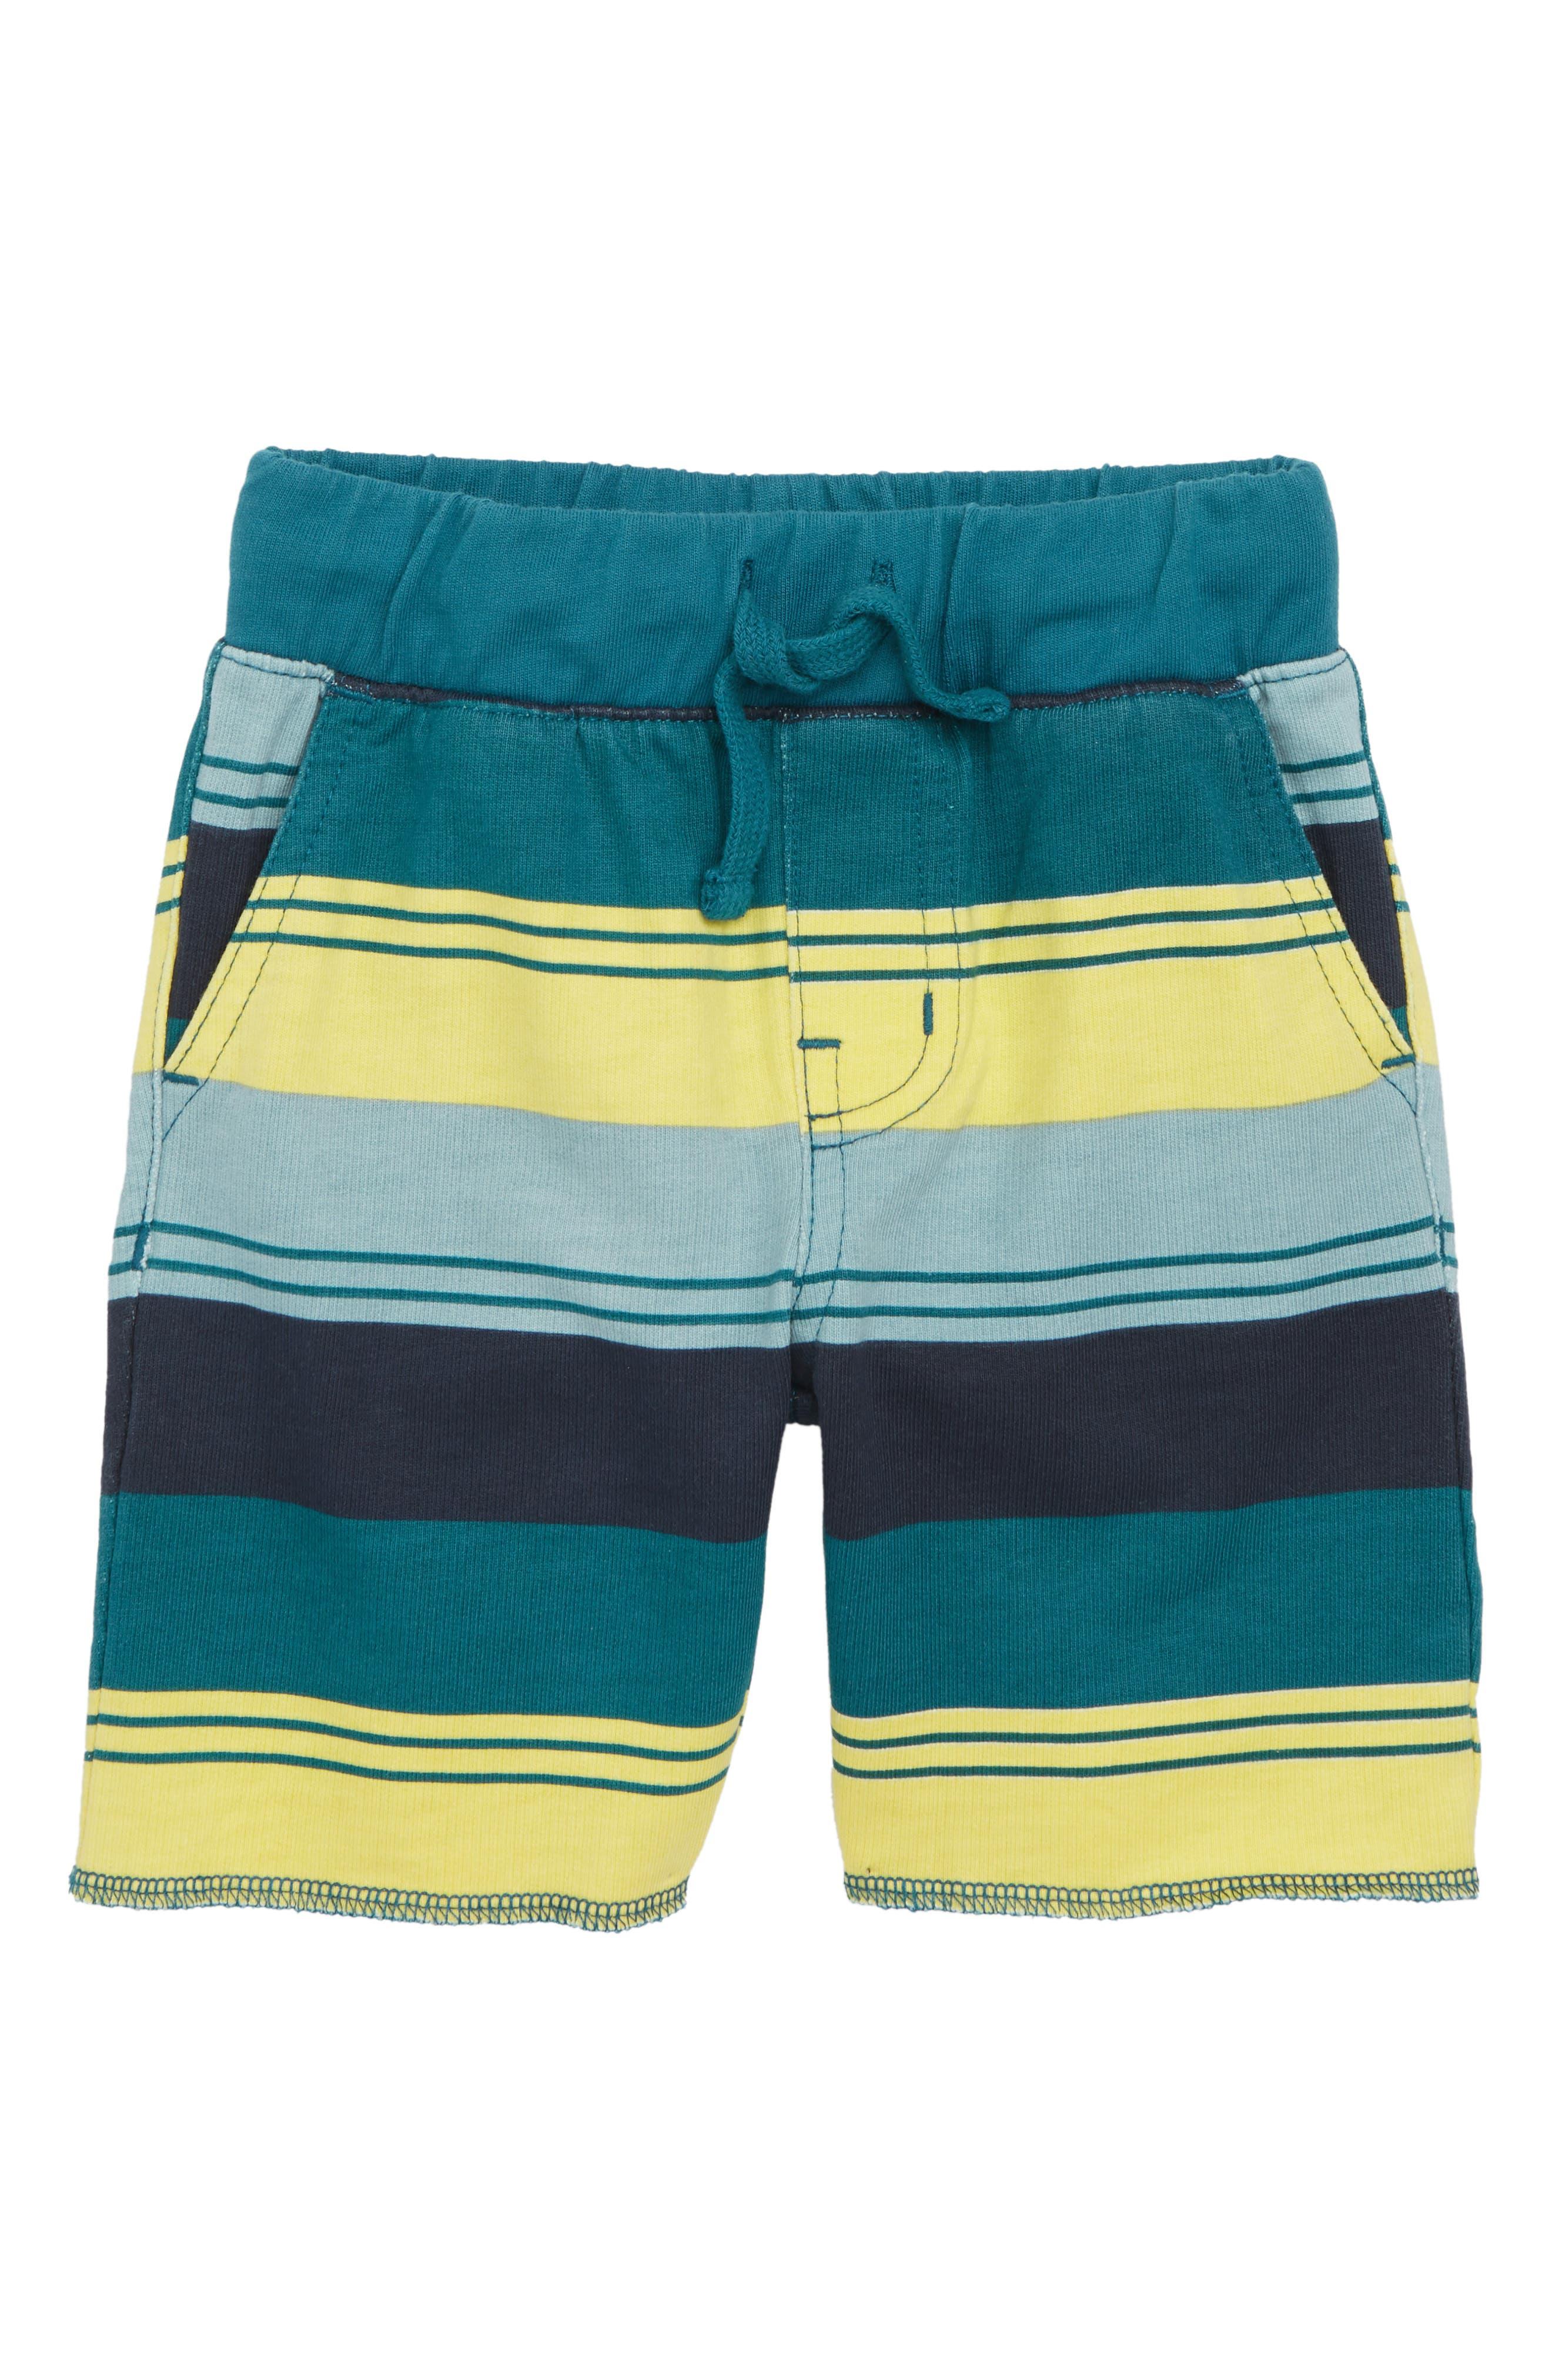 Stripe Cruiser Shorts,                         Main,                         color, Indigo Tri-Stripe